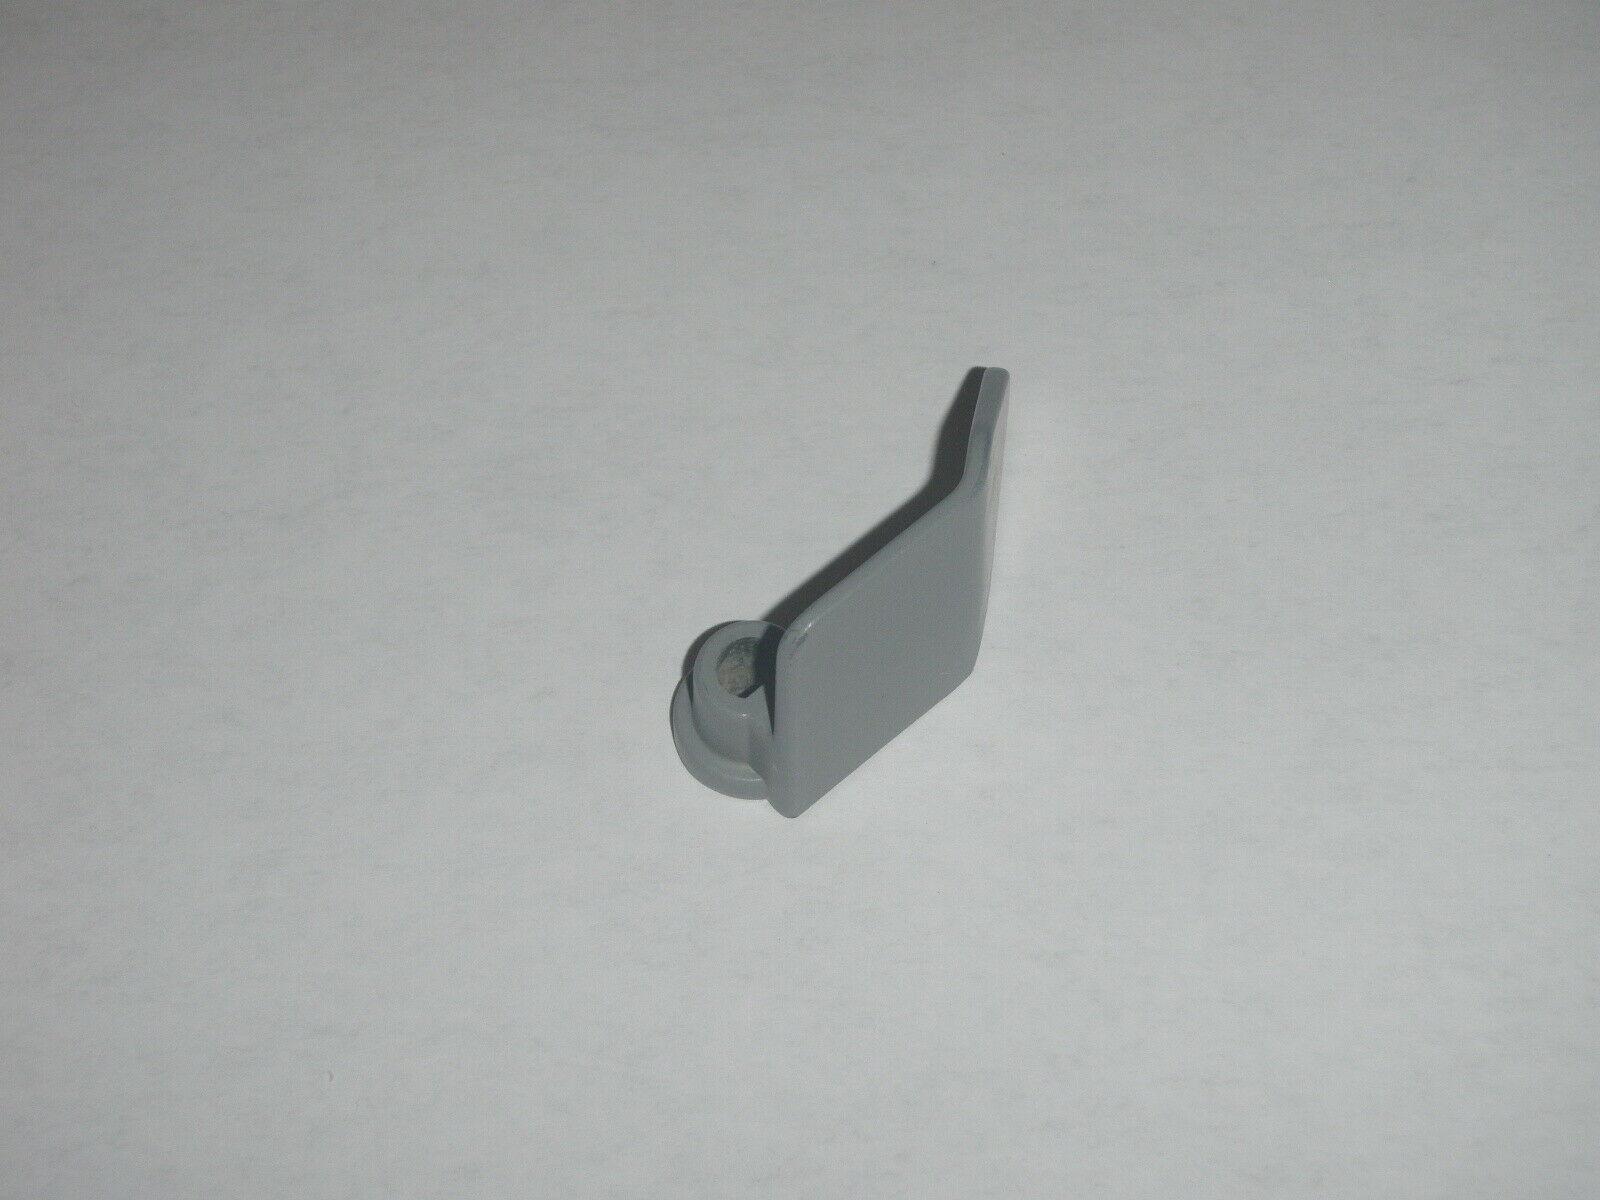 Breadman Bread Maker Machine OEM Kneading Blade Paddle for models TR777 TR2200 image 5